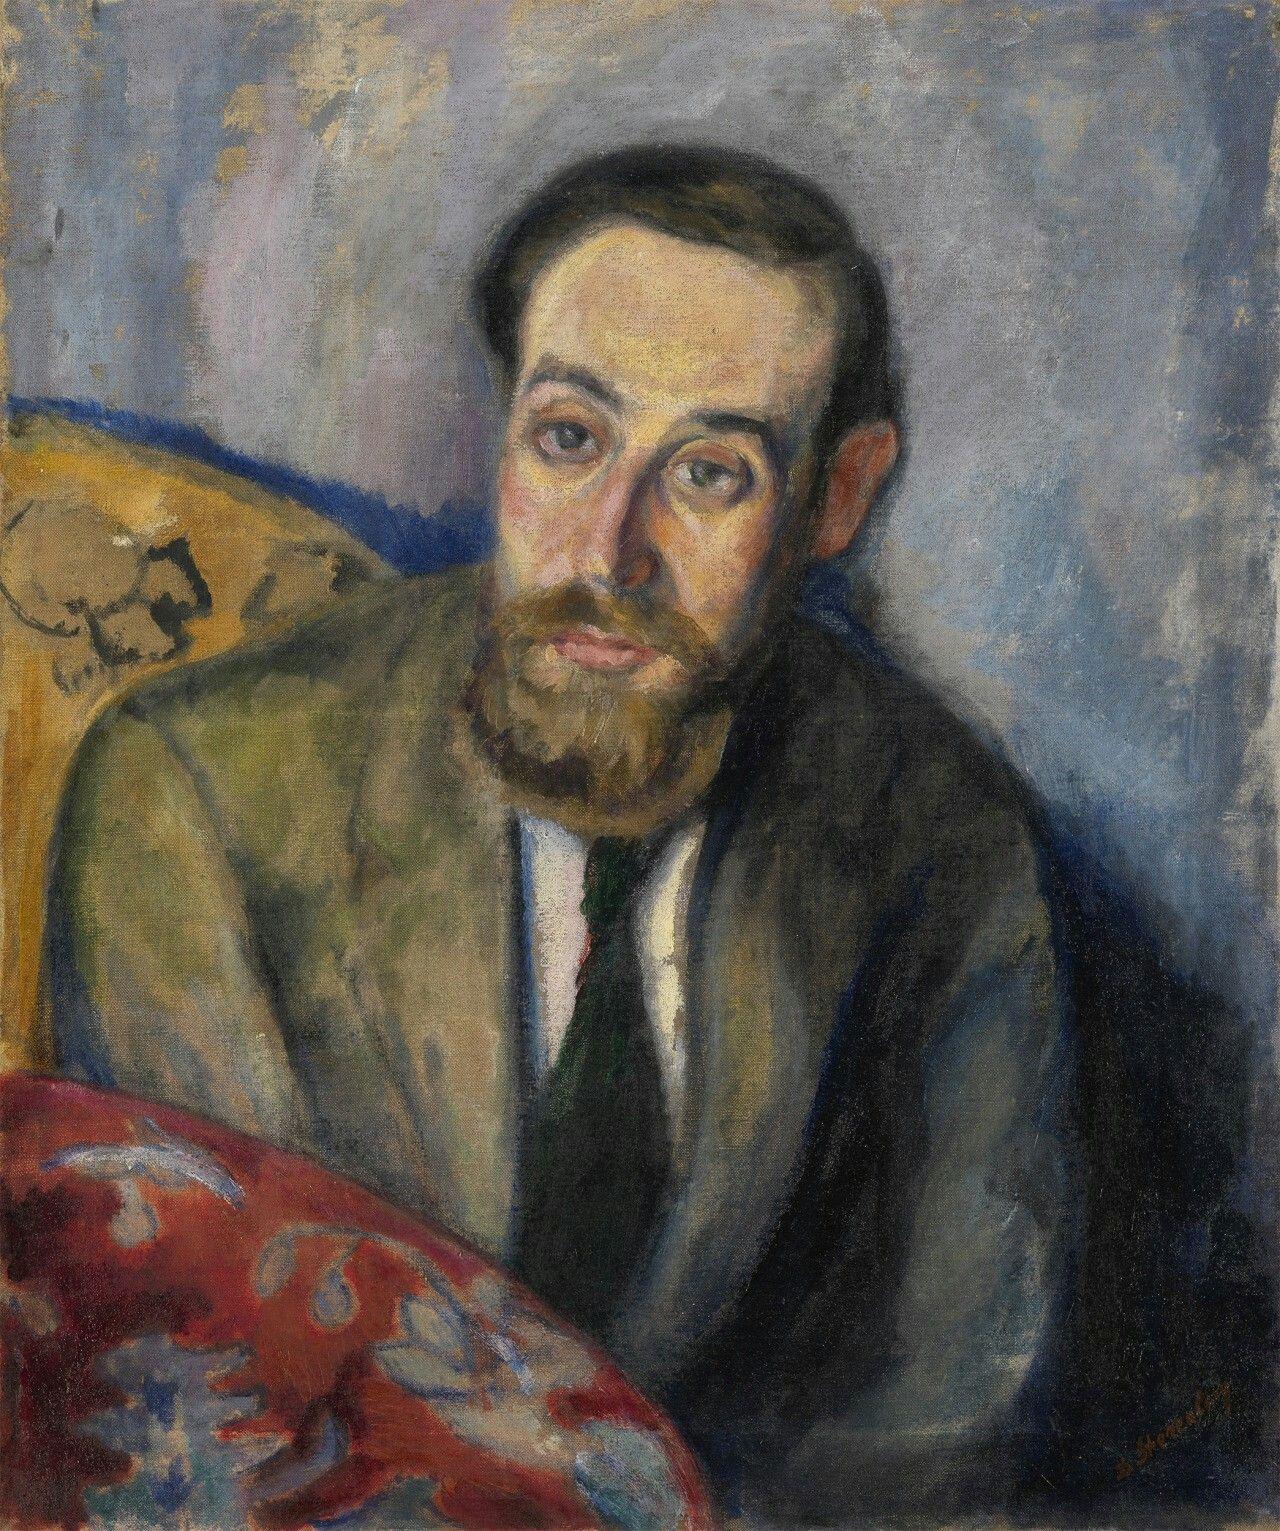 David Shterenberg (Russian, 1881-1948),Self-portrait. Oil on canvas, 61 x 50 cm.